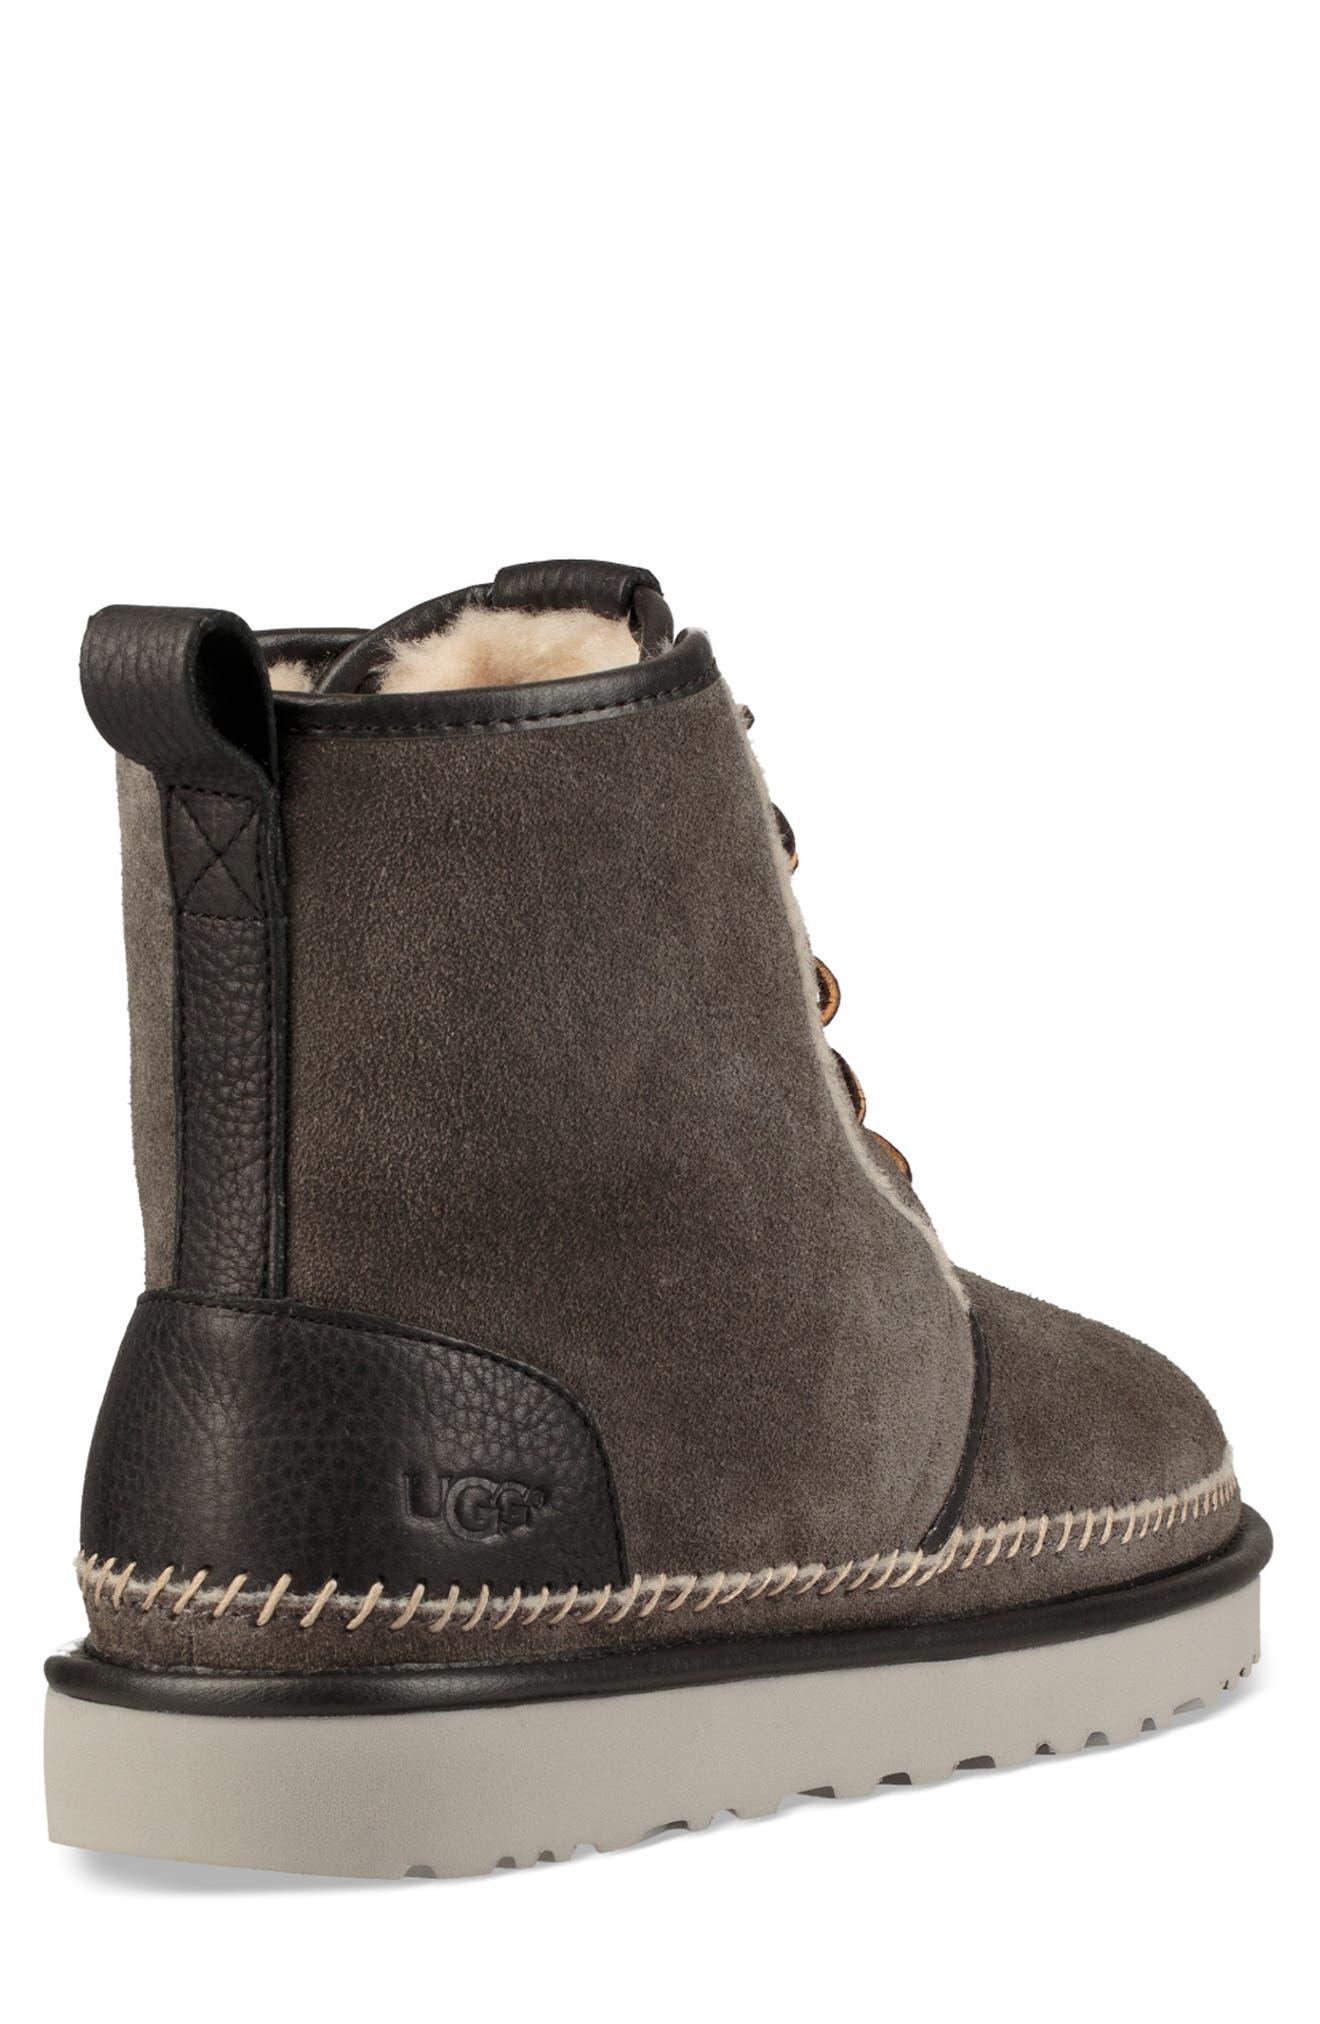 Harkley Stitch Plain Toe Boot,                             Alternate thumbnail 2, color,                             DARK GREY